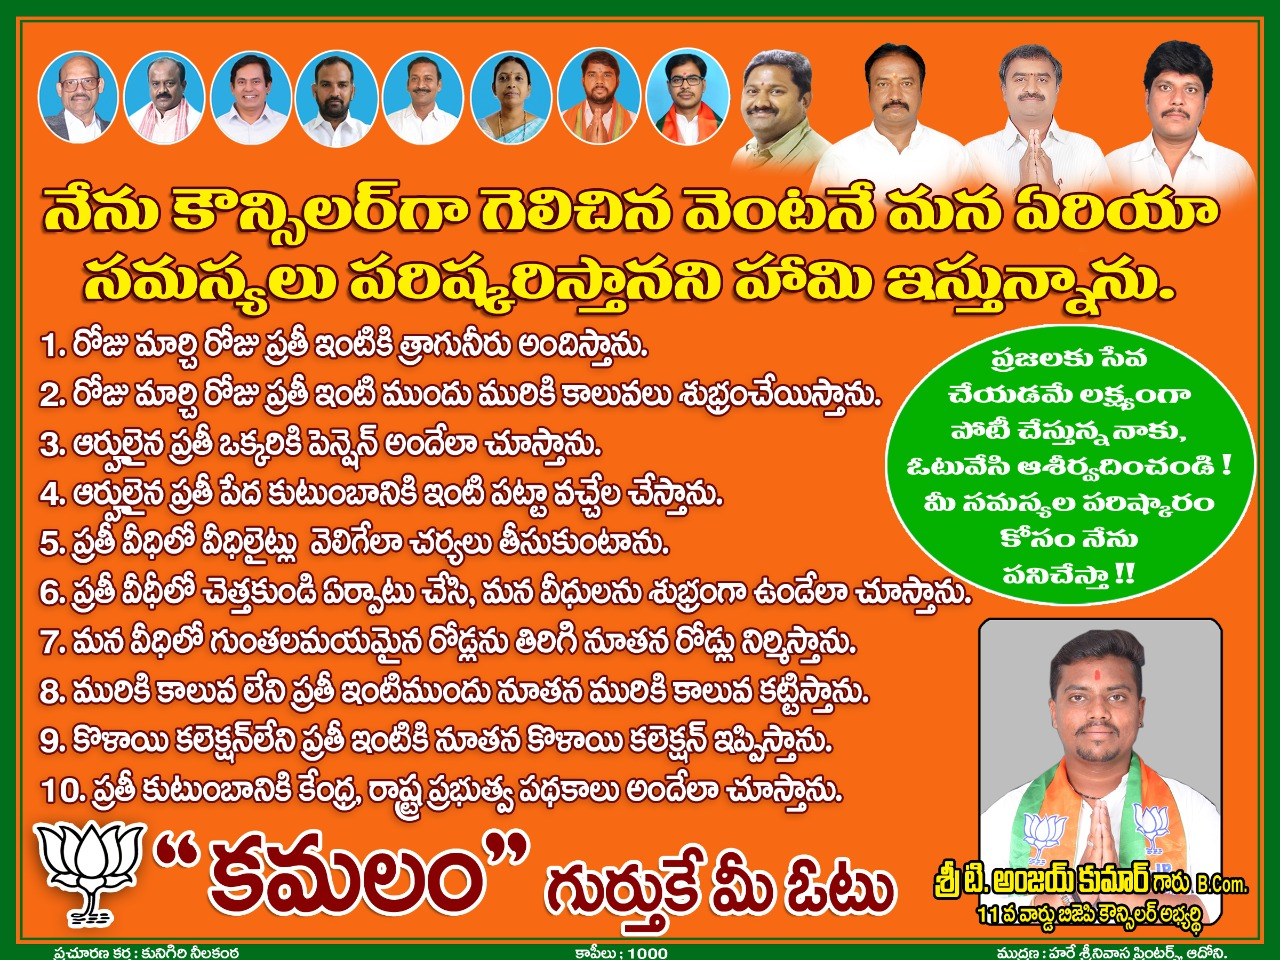 Hindu Anjai Kumar | Town President | Town General Secretary | Co-convener of Animal Conservation Committee | ABVP Member | ABVP | BJYM | BJP | Adoni | Kurnool | Andhra Pradesh | theLeadersPage